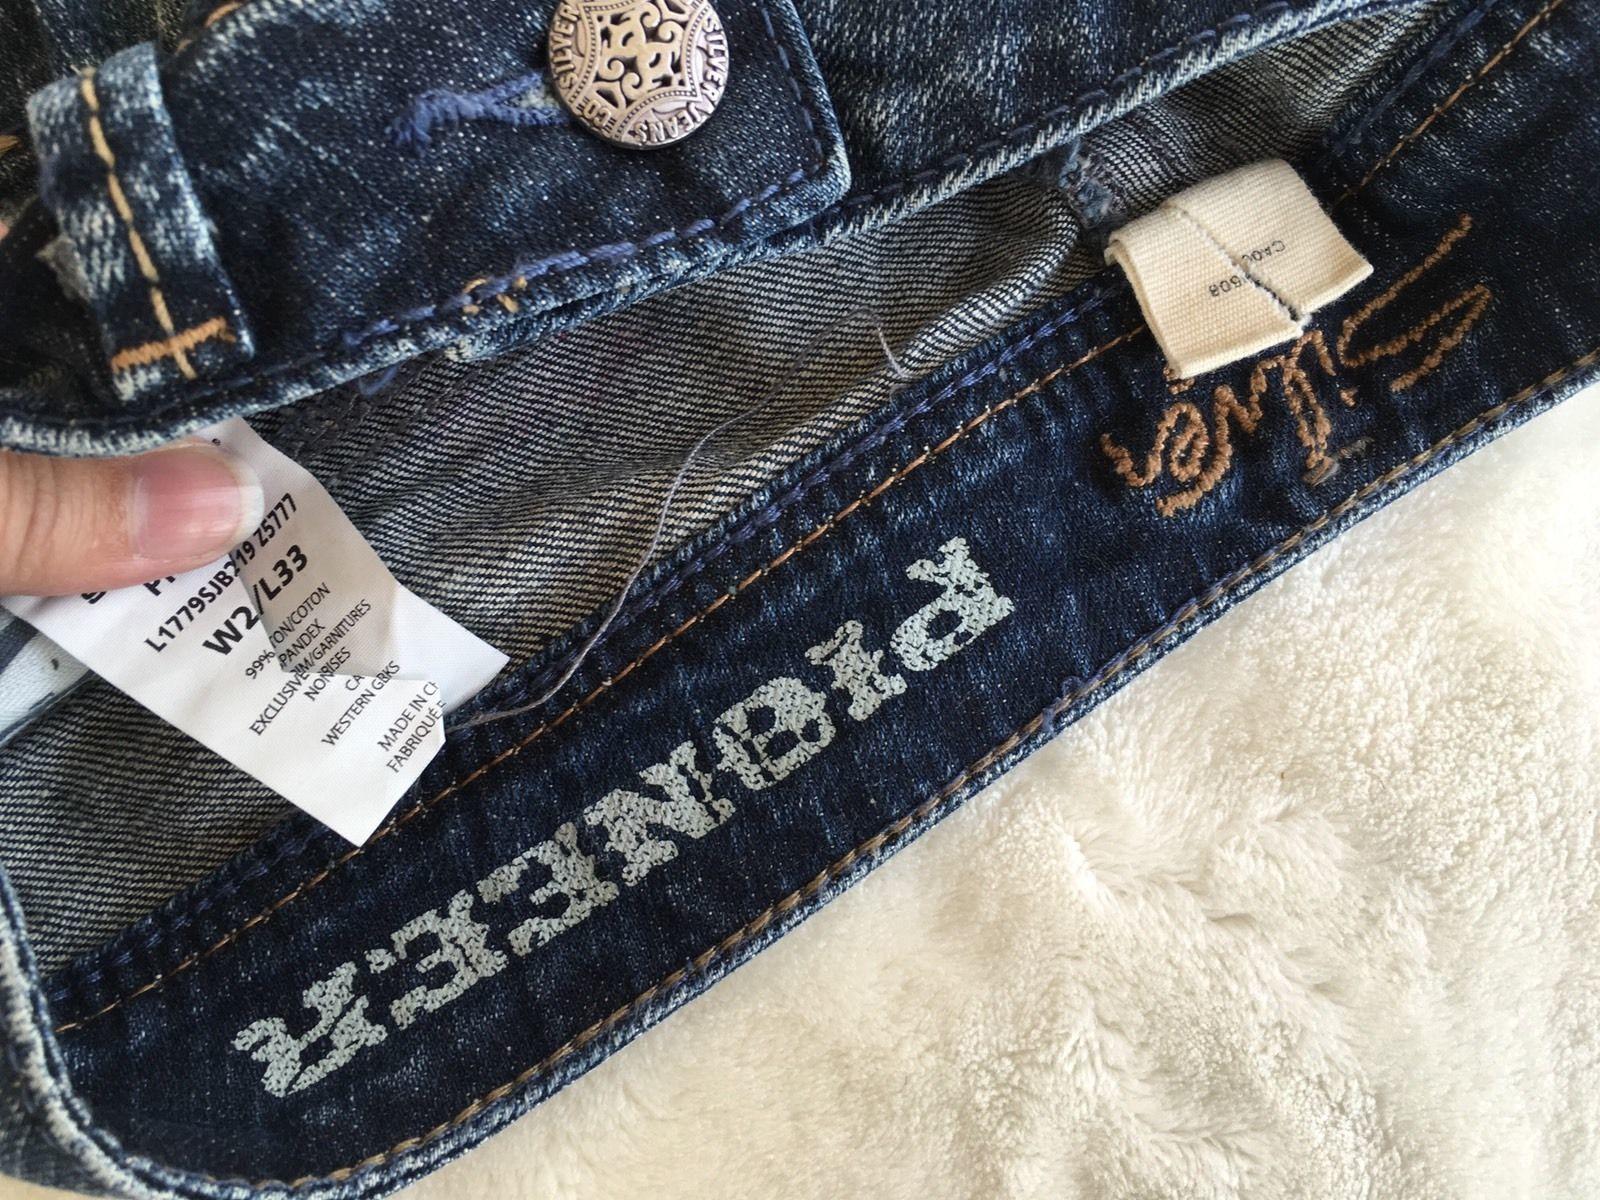 SILVER Jeans Sale Low Rise Pioneer Flap Pocket Denim Stretch Jean Mid Shorts 26